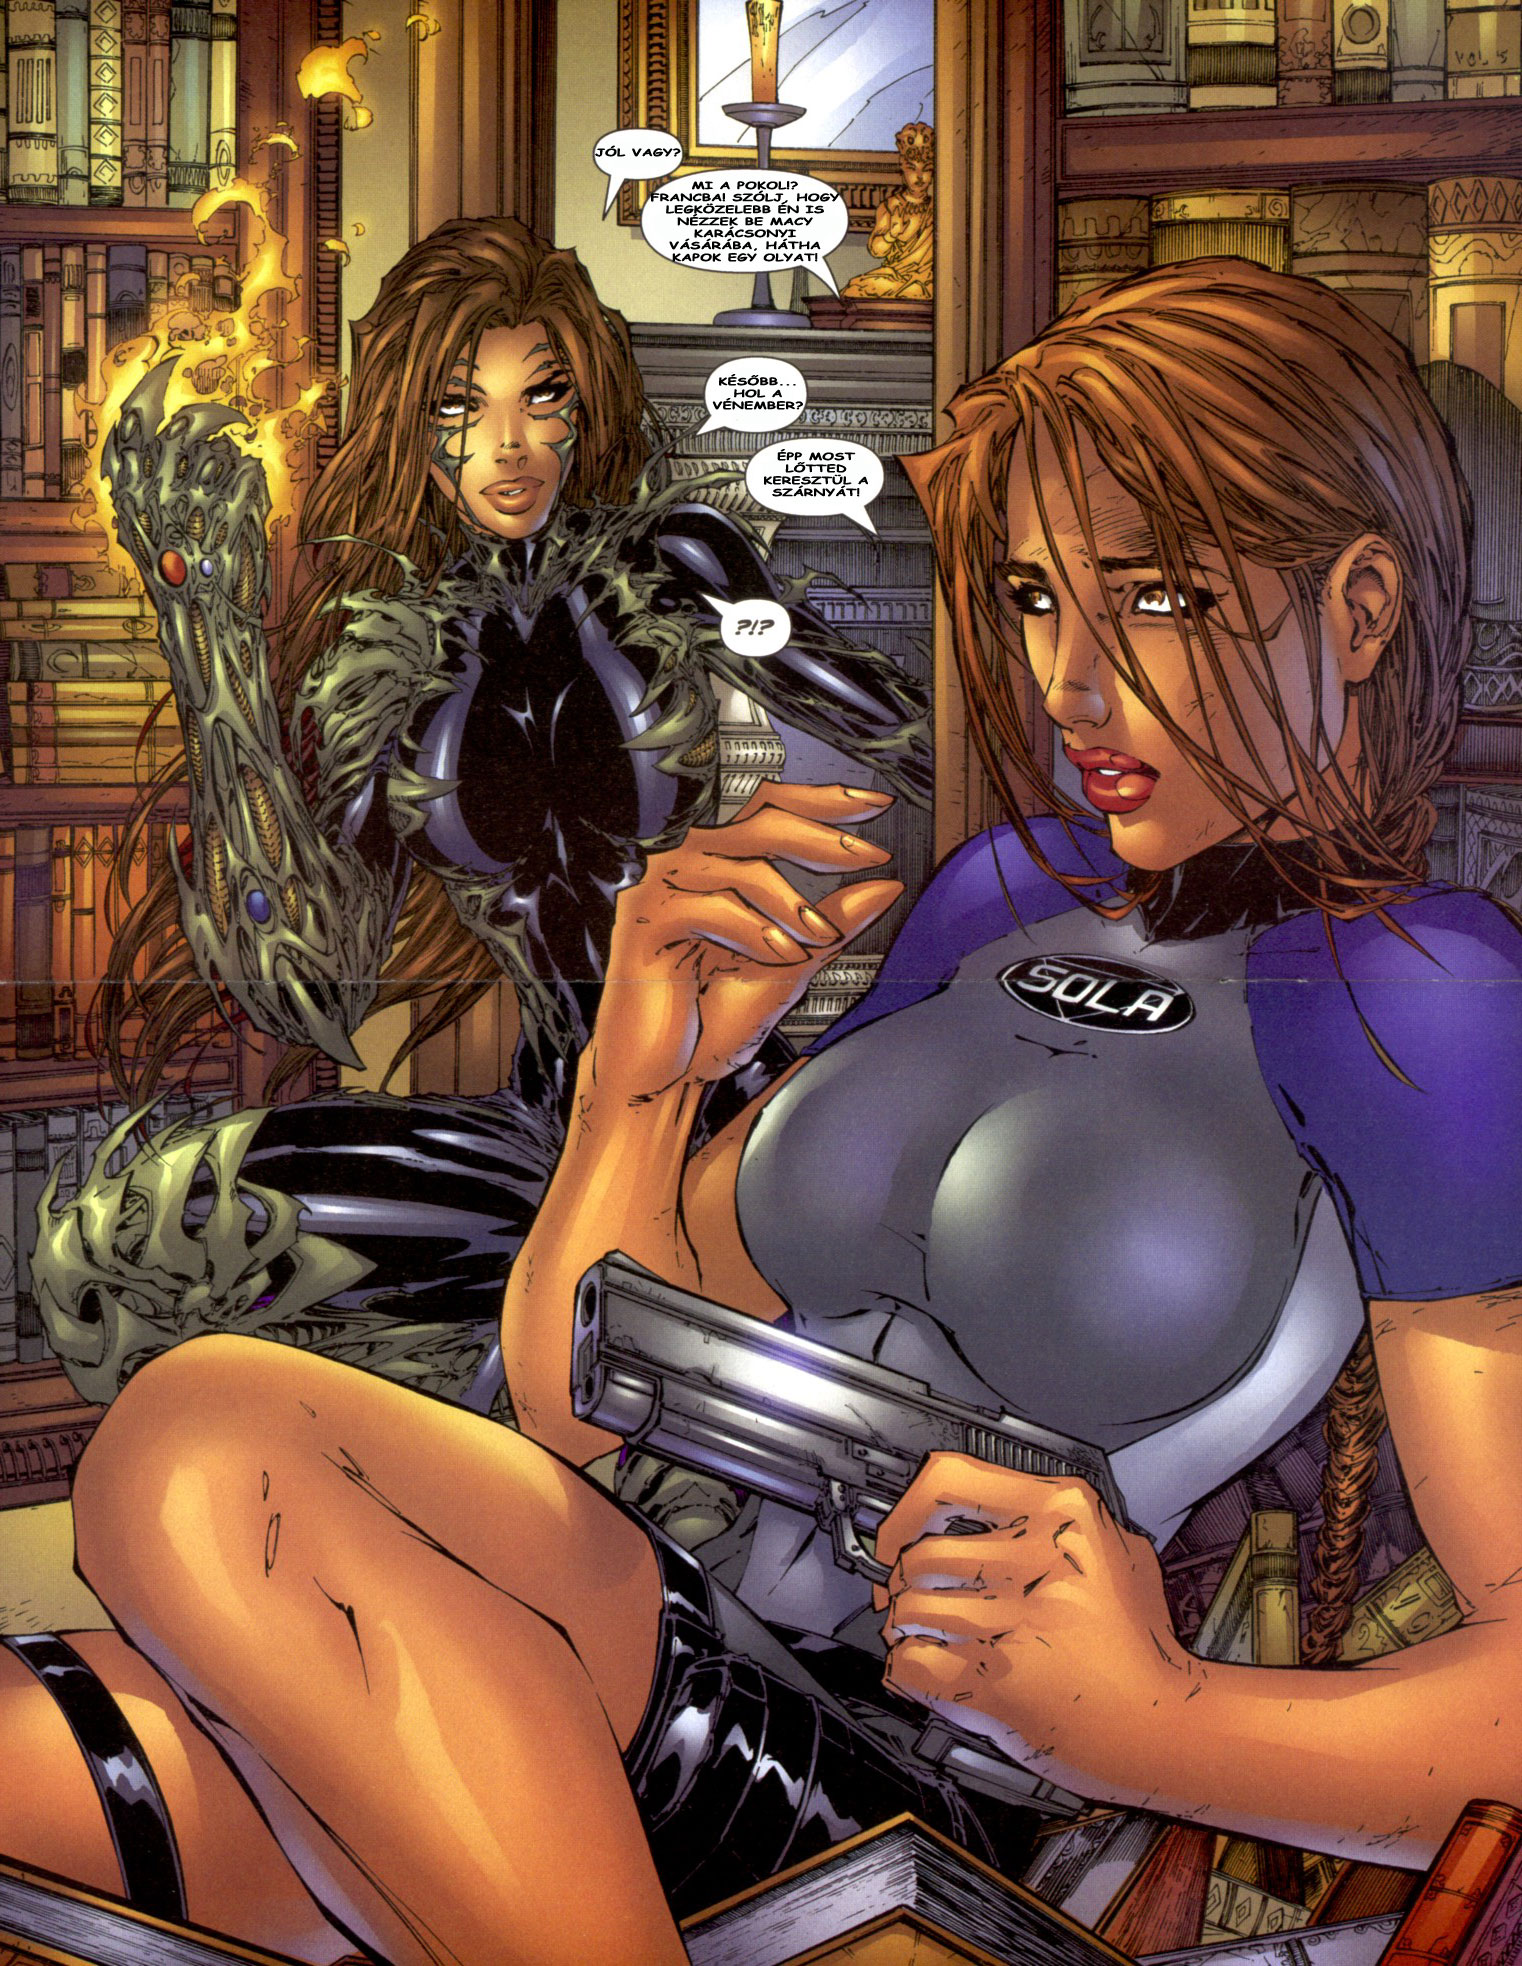 Erotic lesbian lara croft toons fucked pics